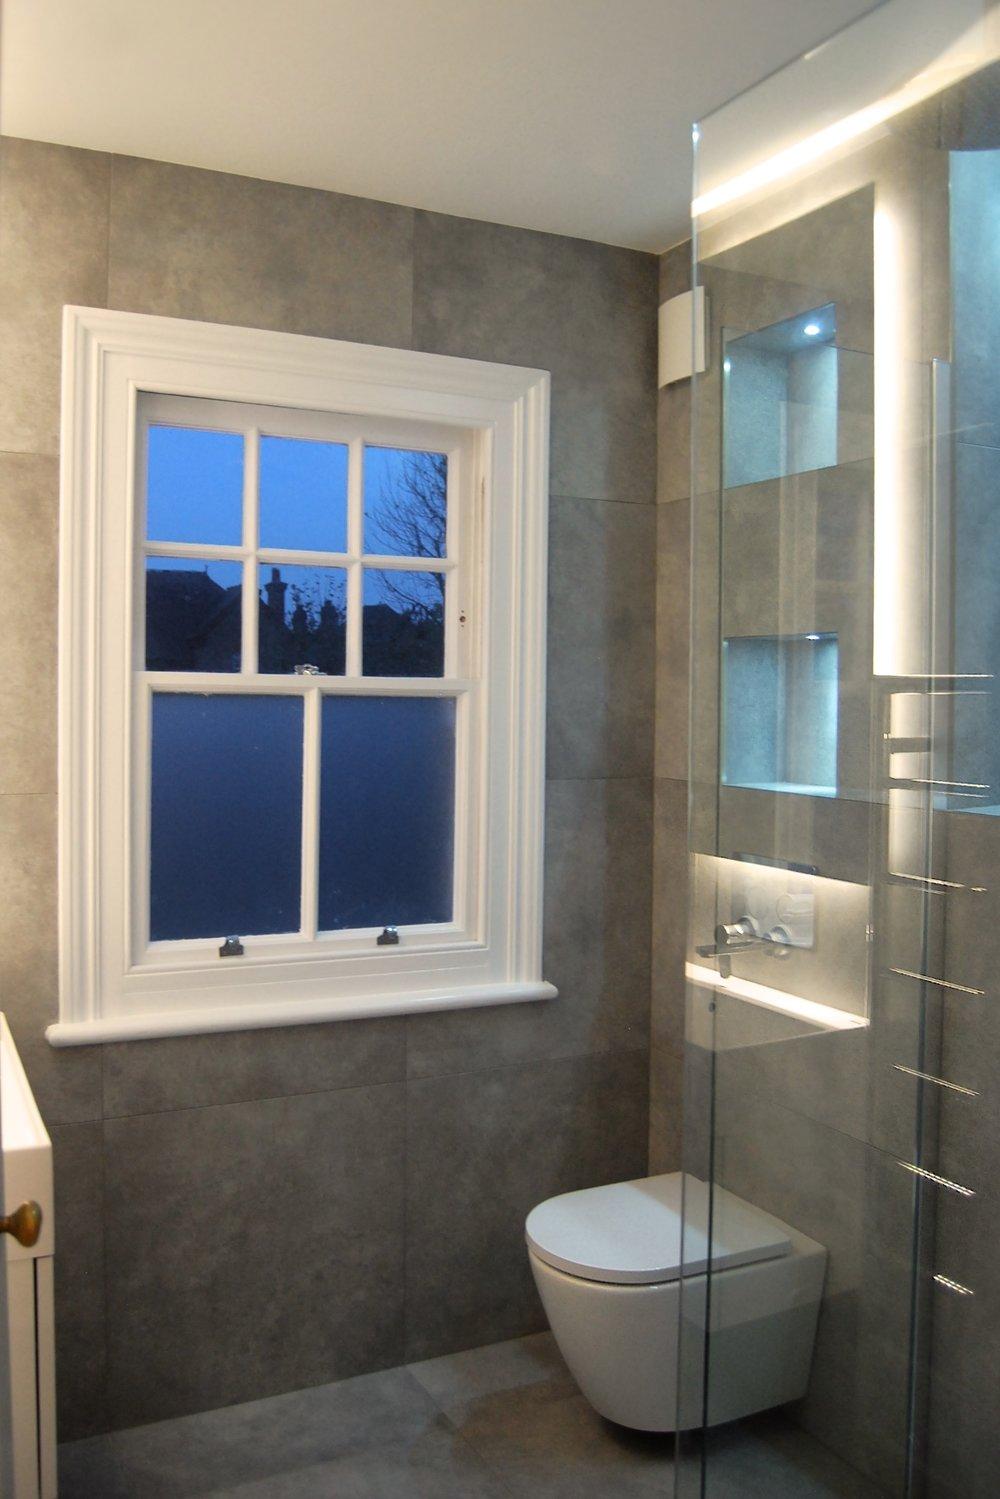 Retreat Bathrooms Bathroom Design, Refurbishment, Supply & Installation Teddington, Richmond 755.jpg